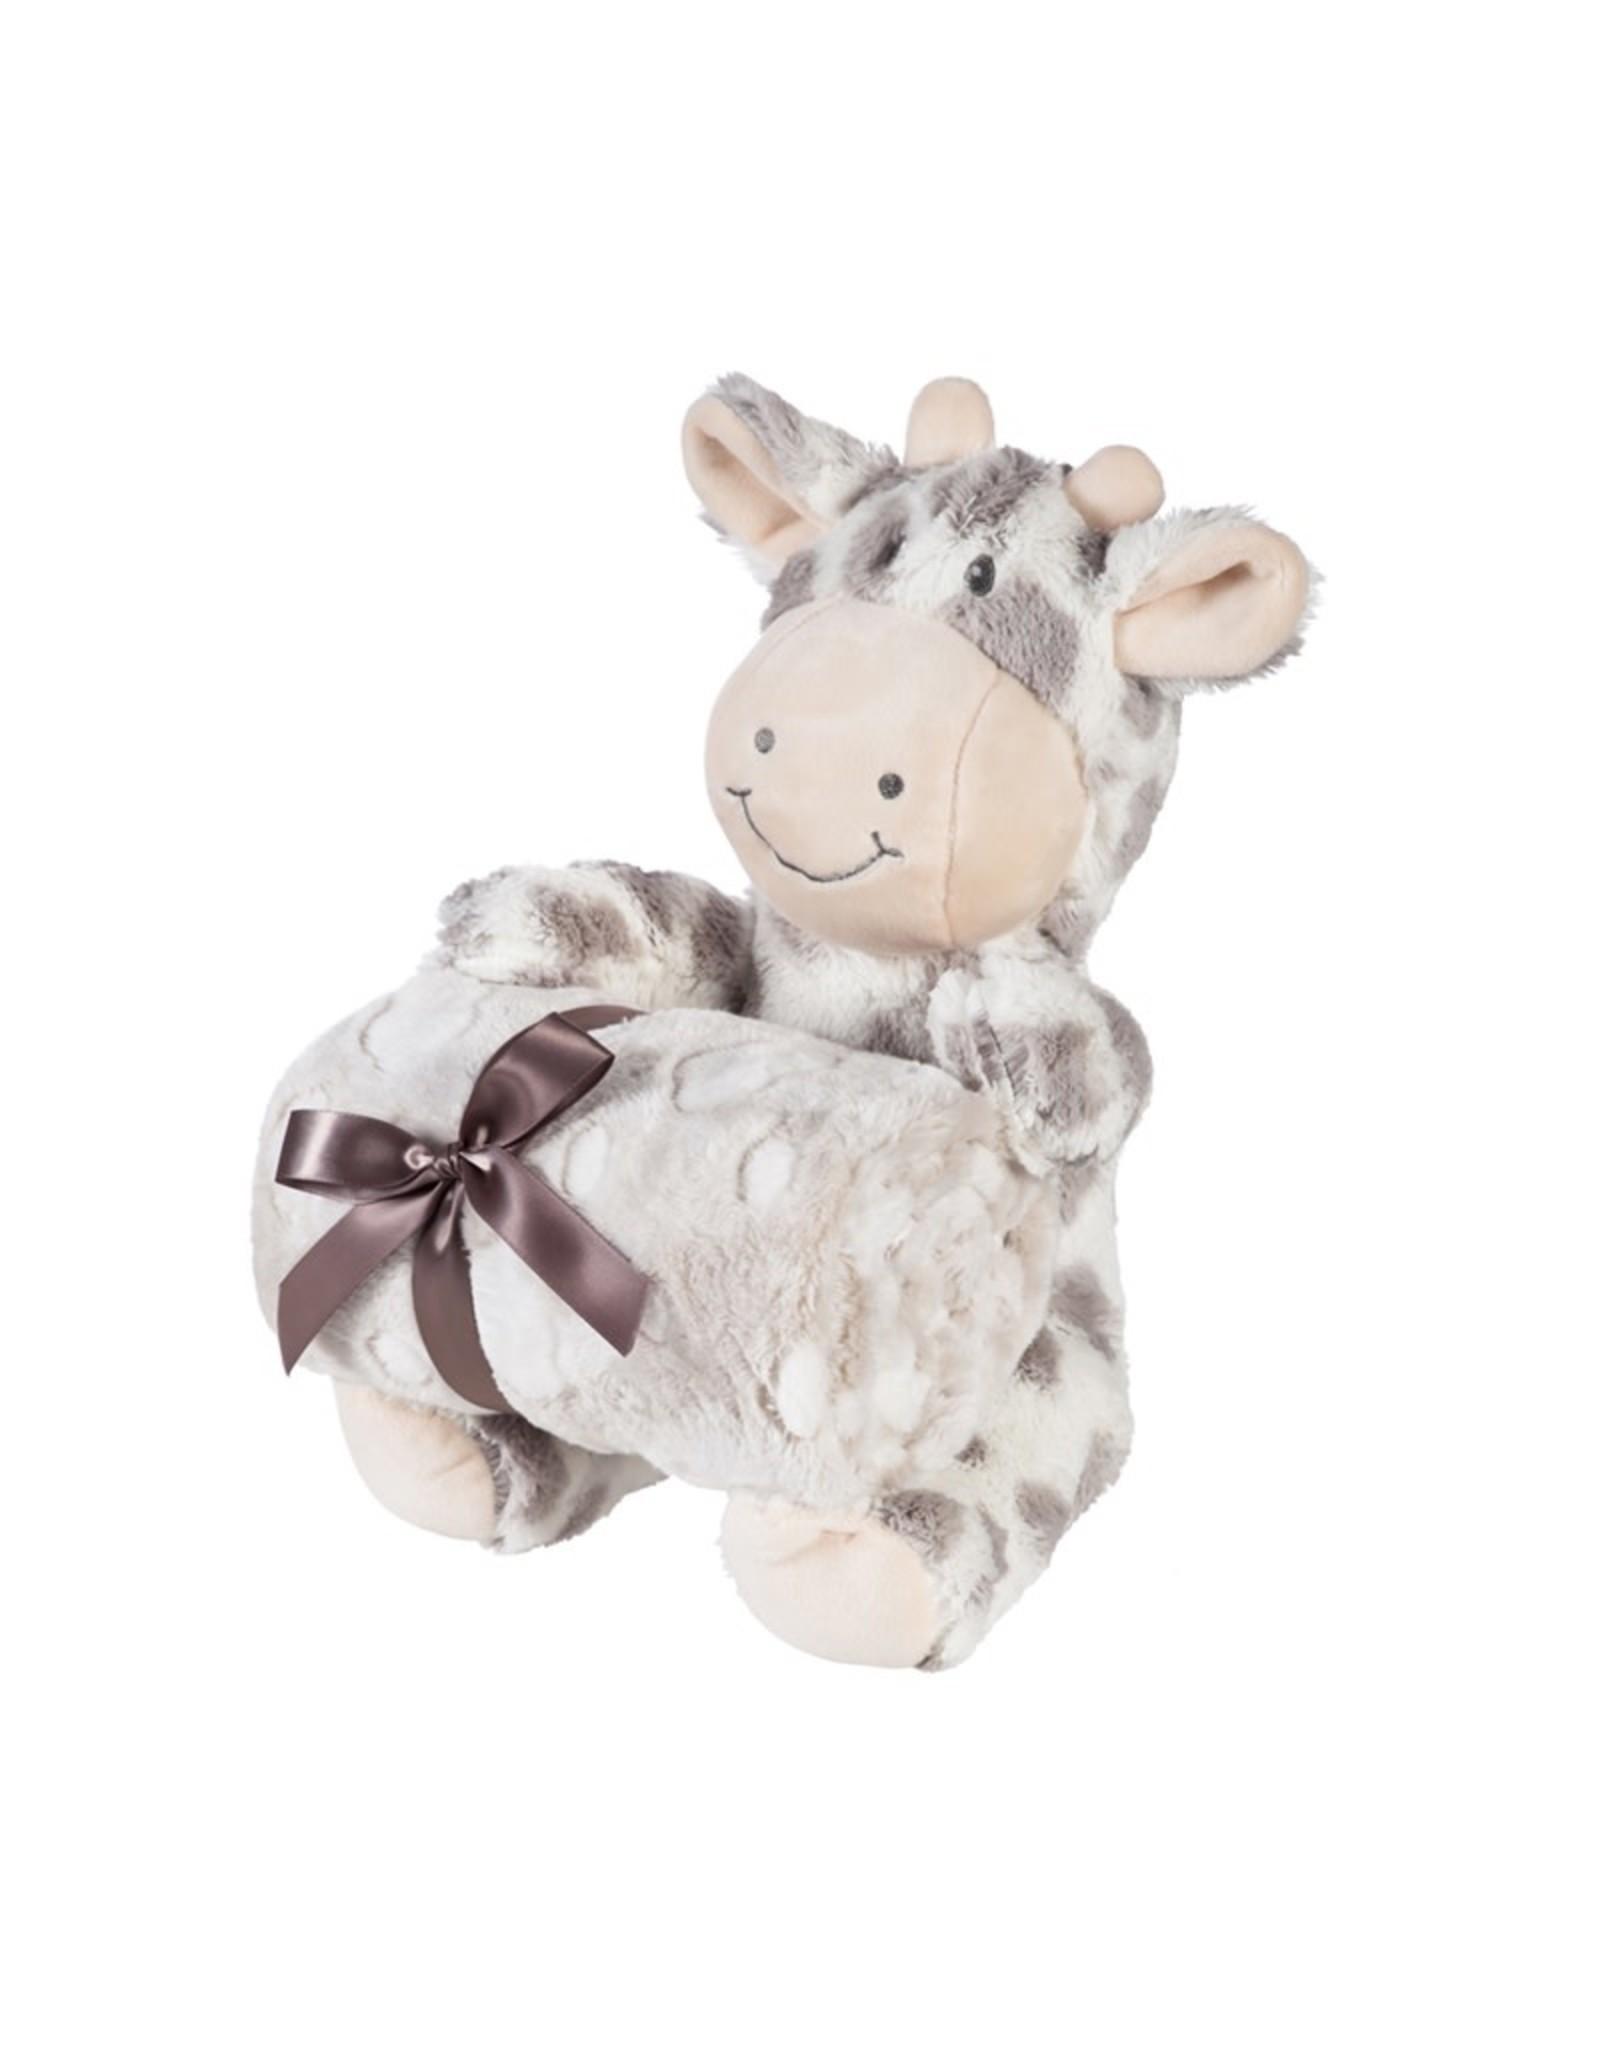 "Evergreen Enterprises Cuddly Giraffe 10""  Stuffed Animal w/Blanket, Gray"